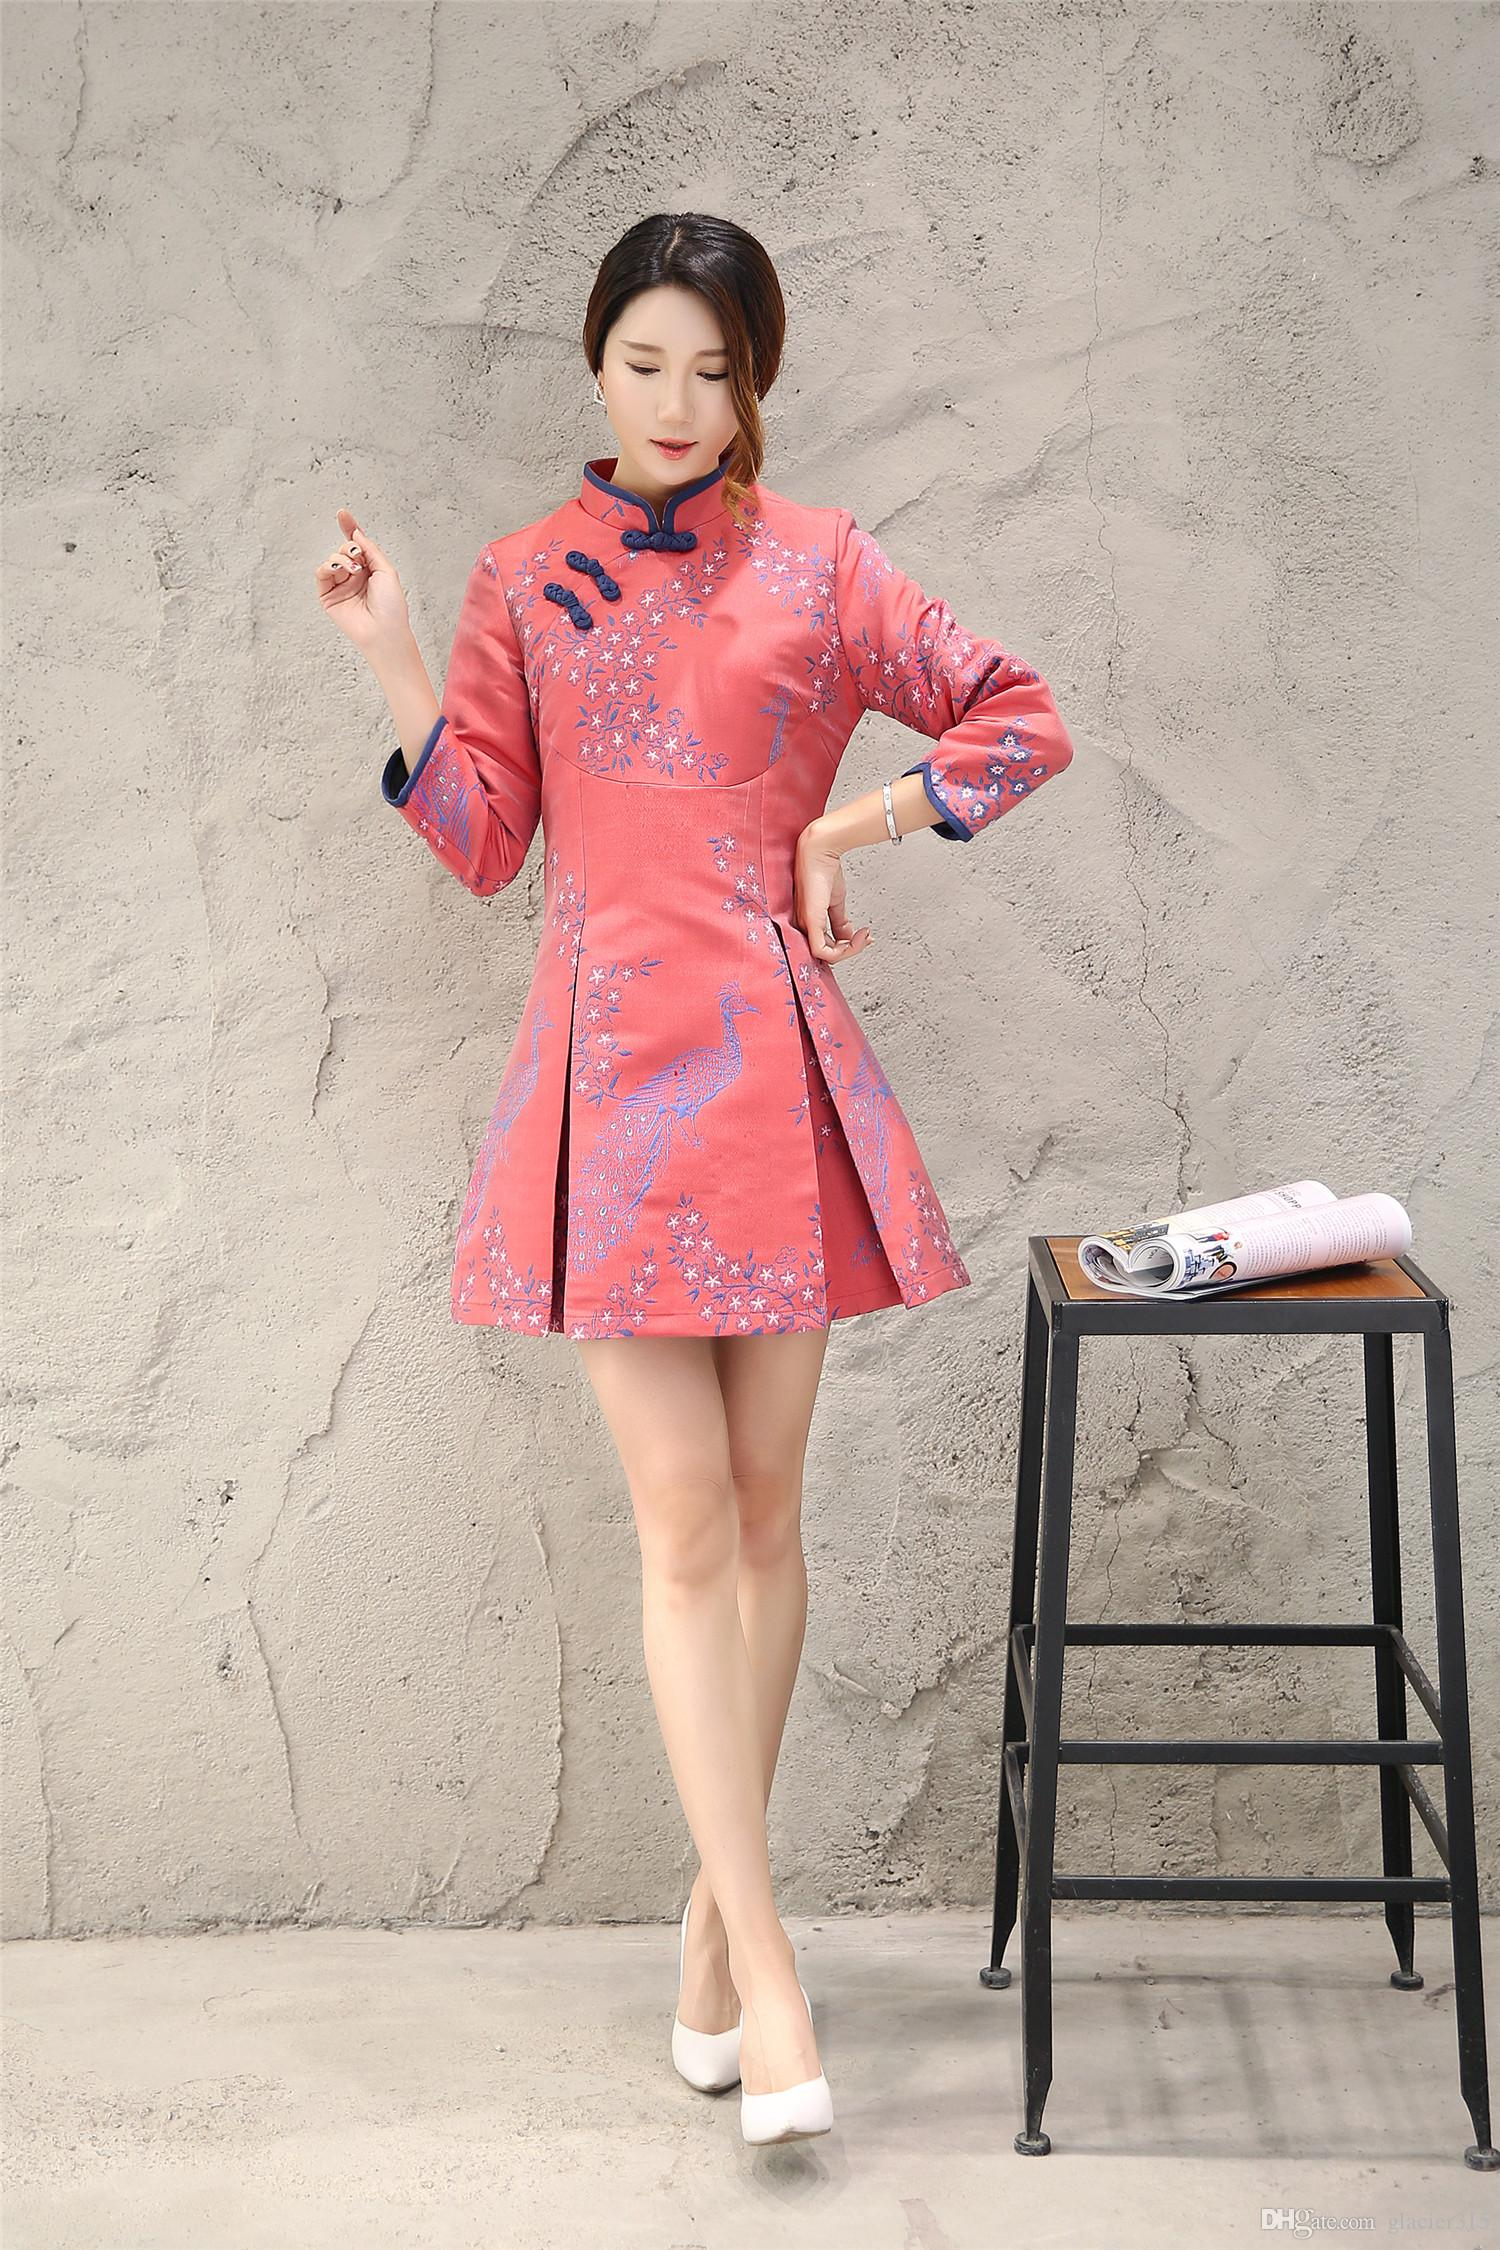 Shanghai Story 3/4 Sleeve Cheongsam Chinese Traditional Clothing ...